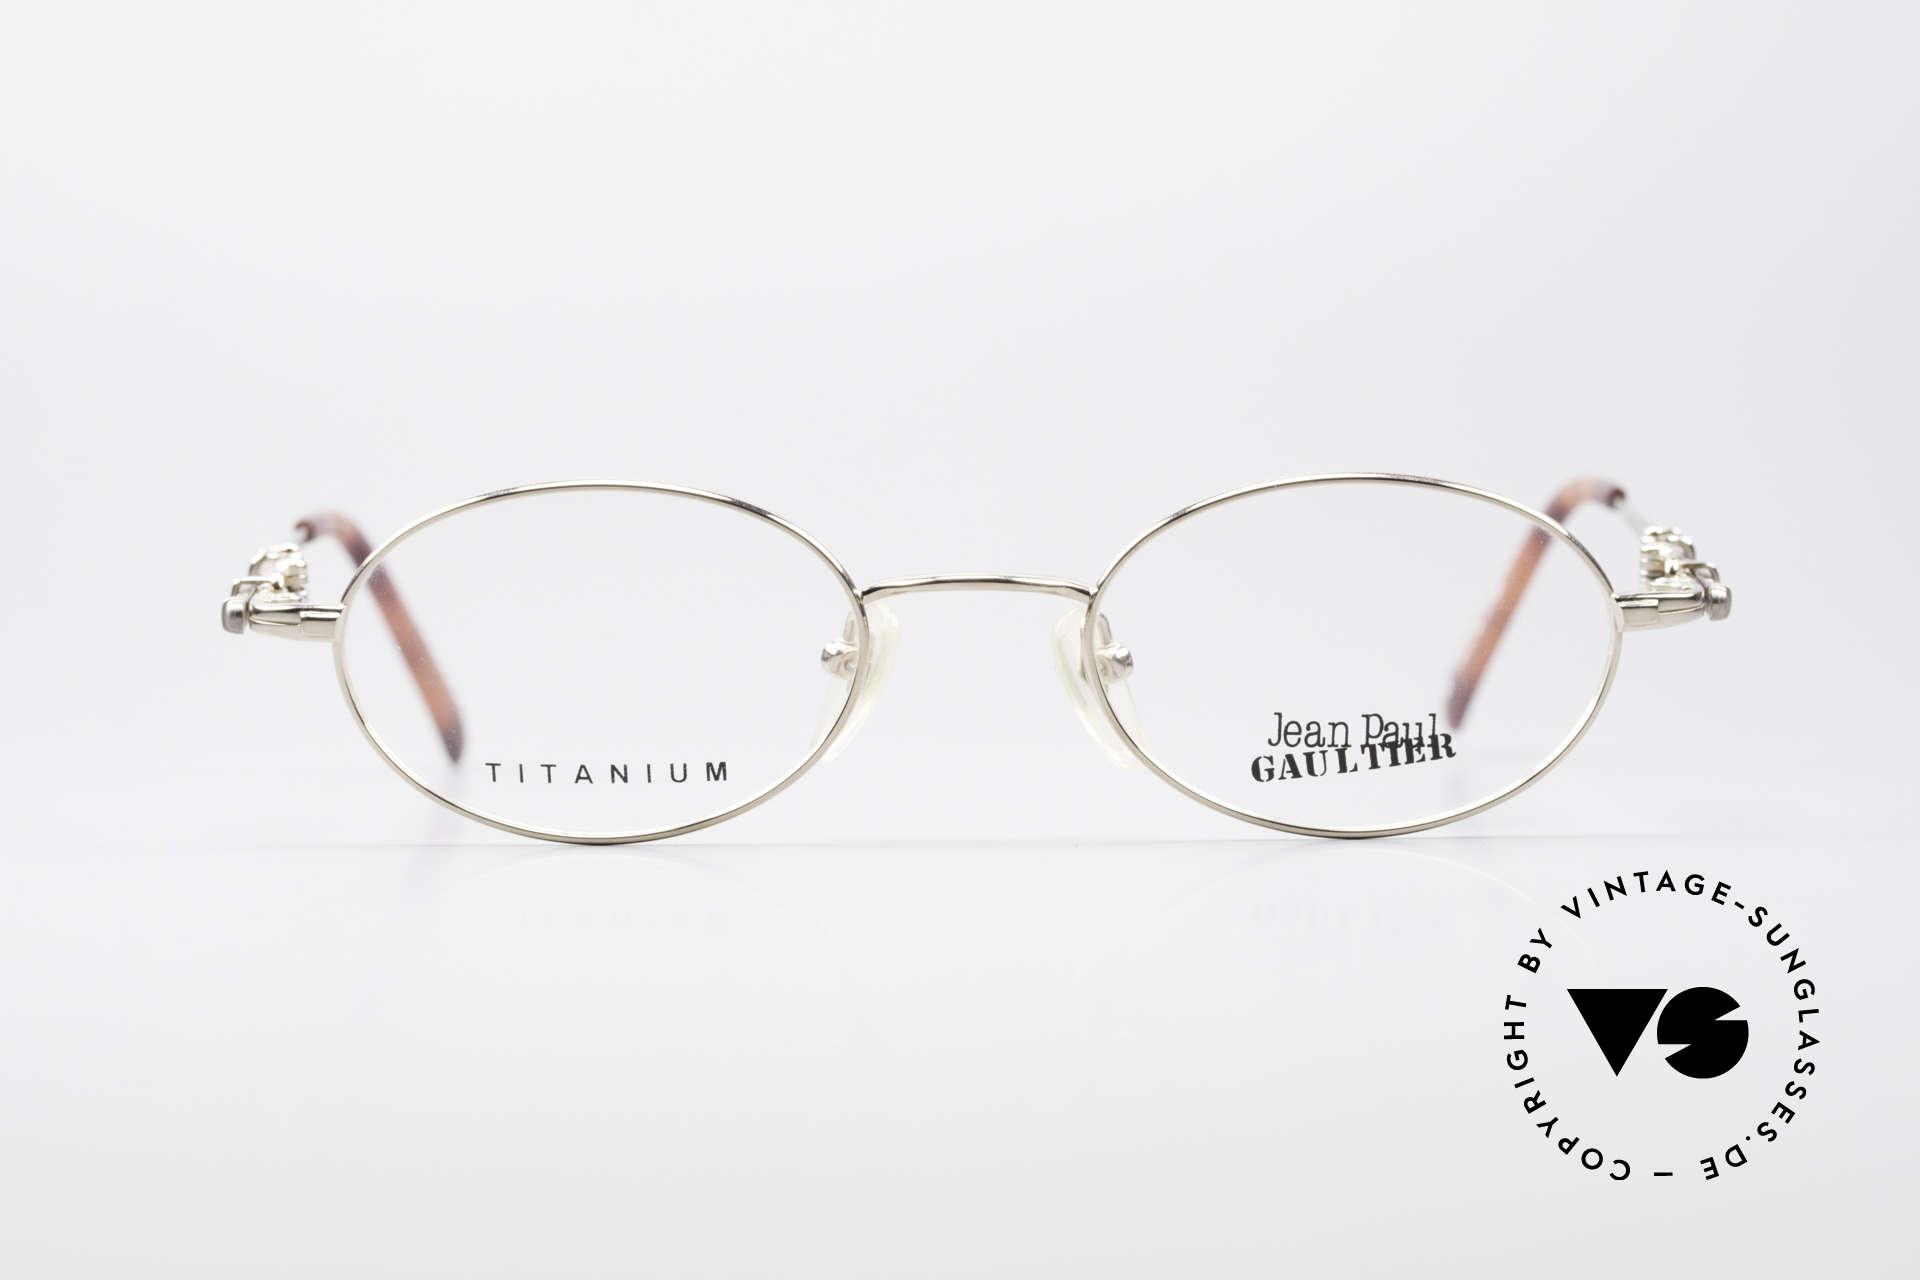 b8f44cdcdb1 Glasses Jean Paul Gaultier 55-0039 Oval Titanium Frame